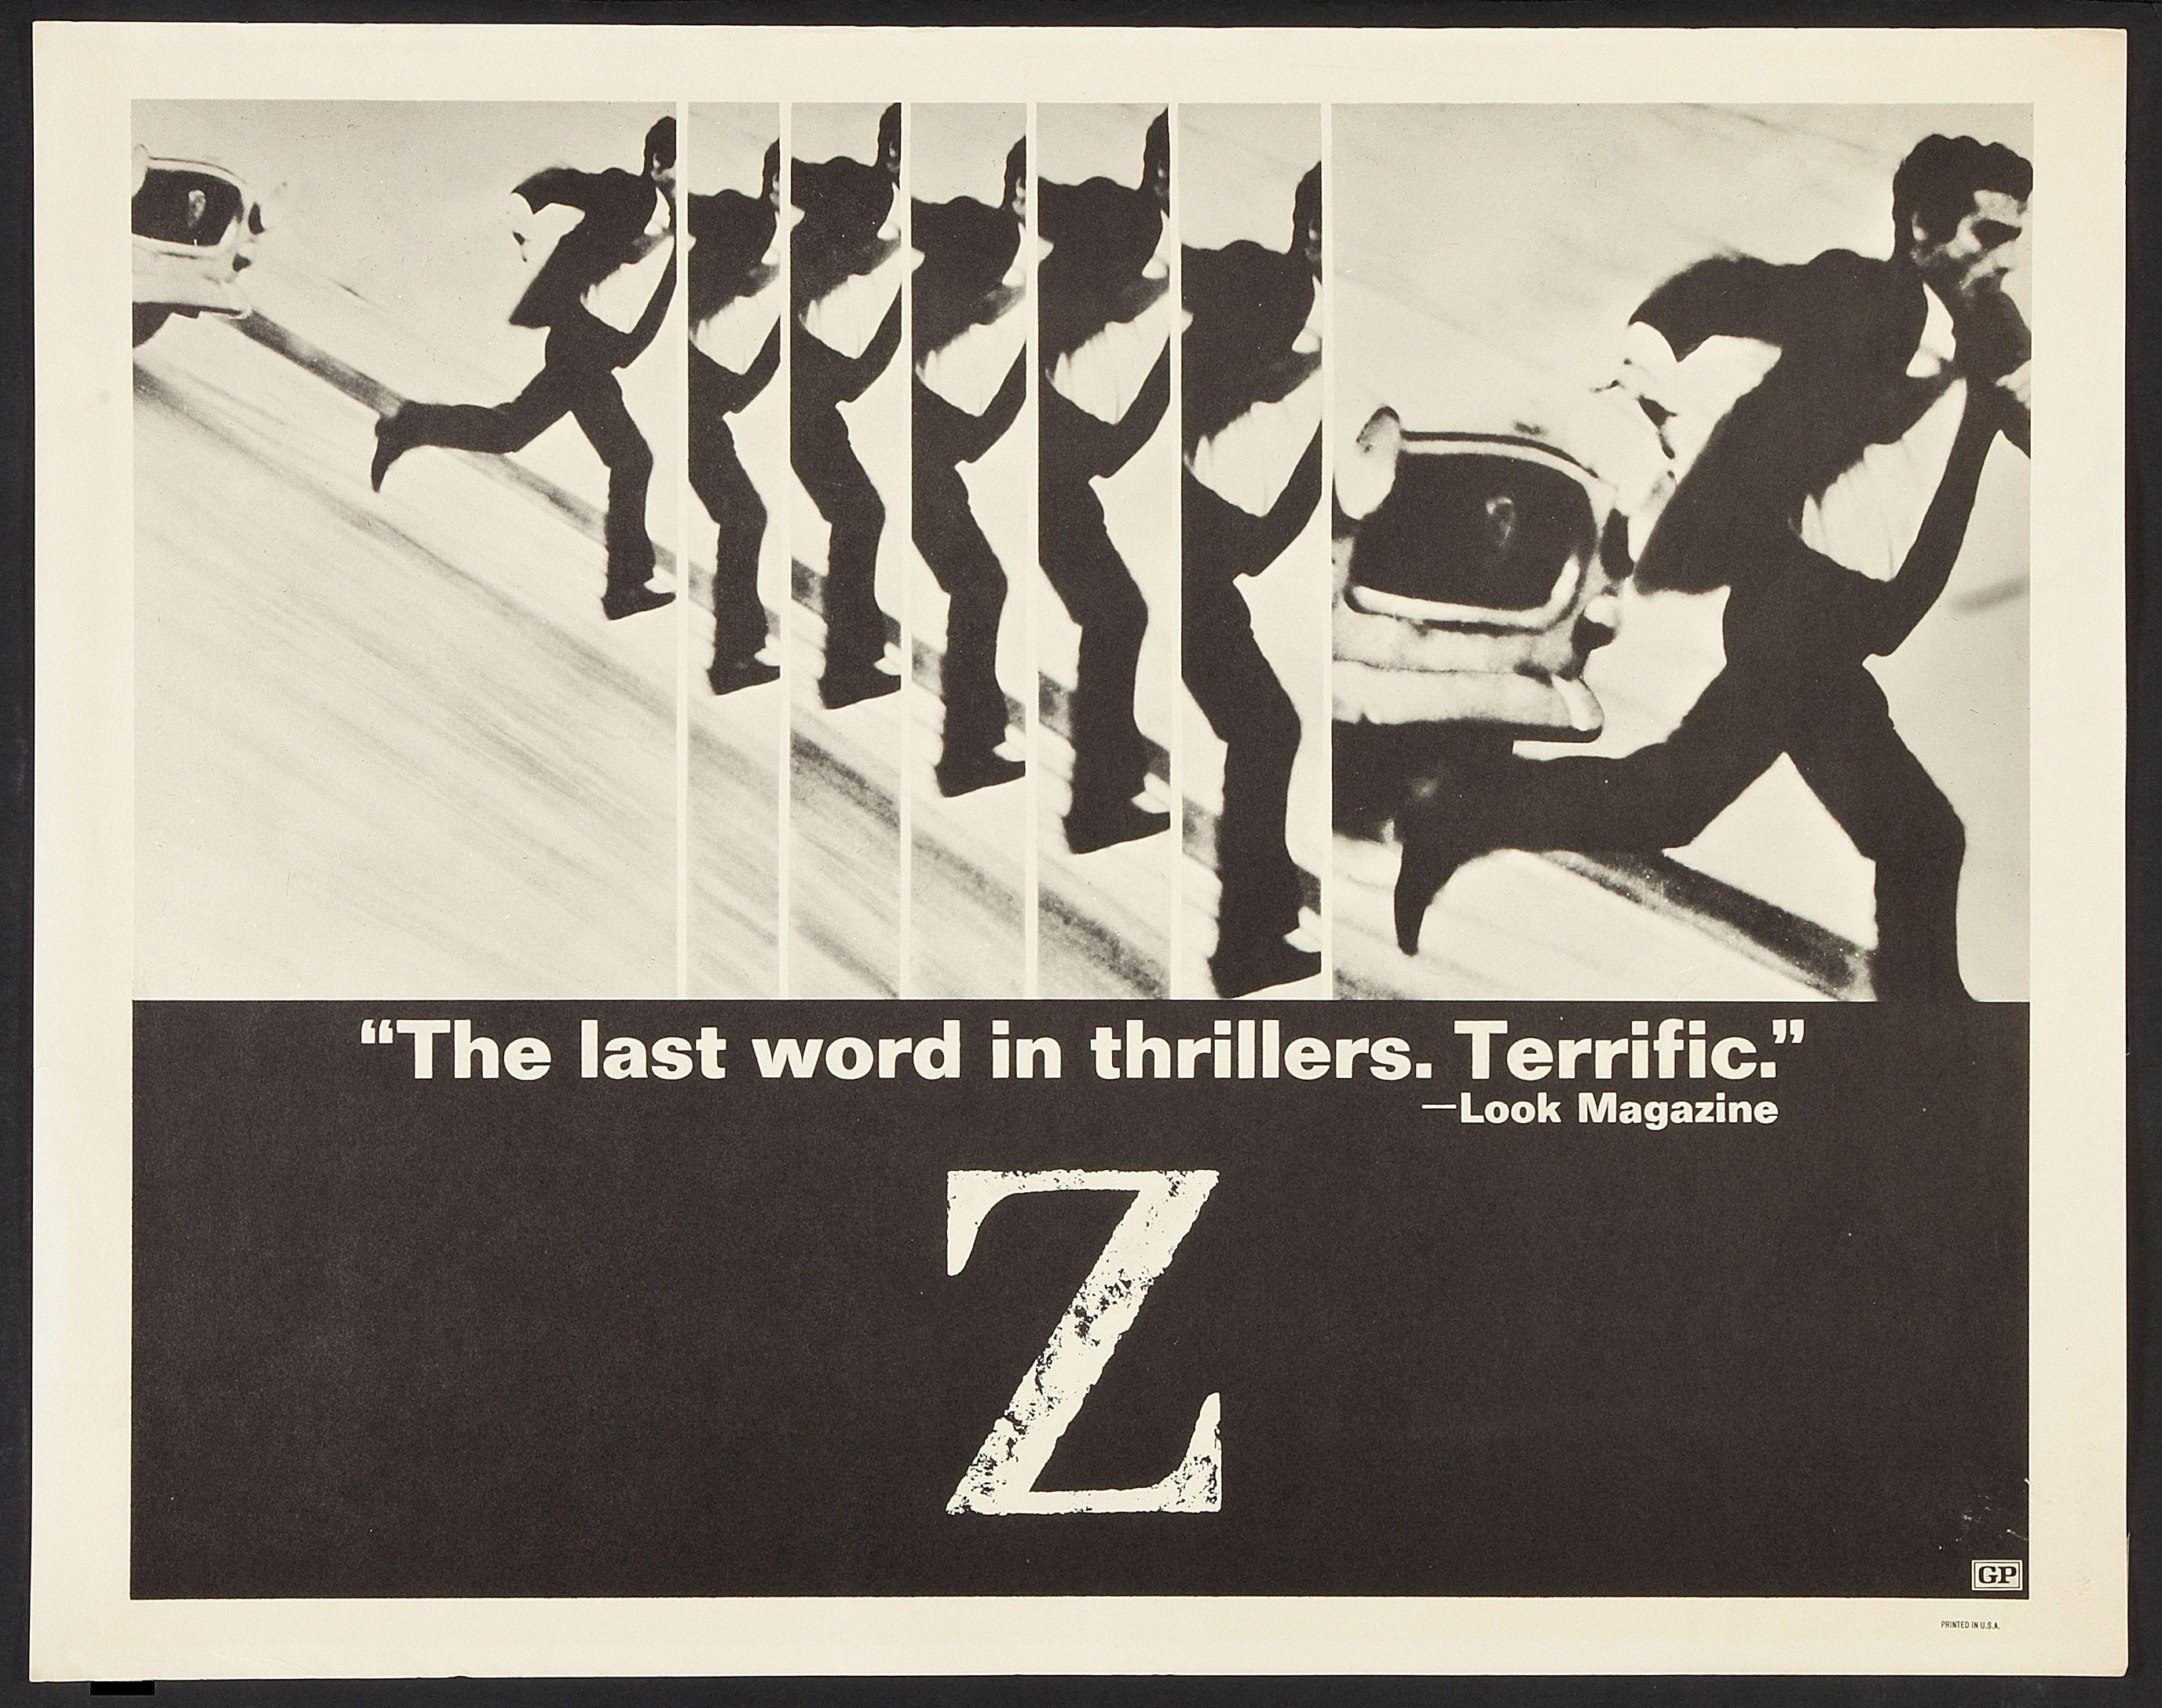 Z Film 1969 - sheikhagar.org